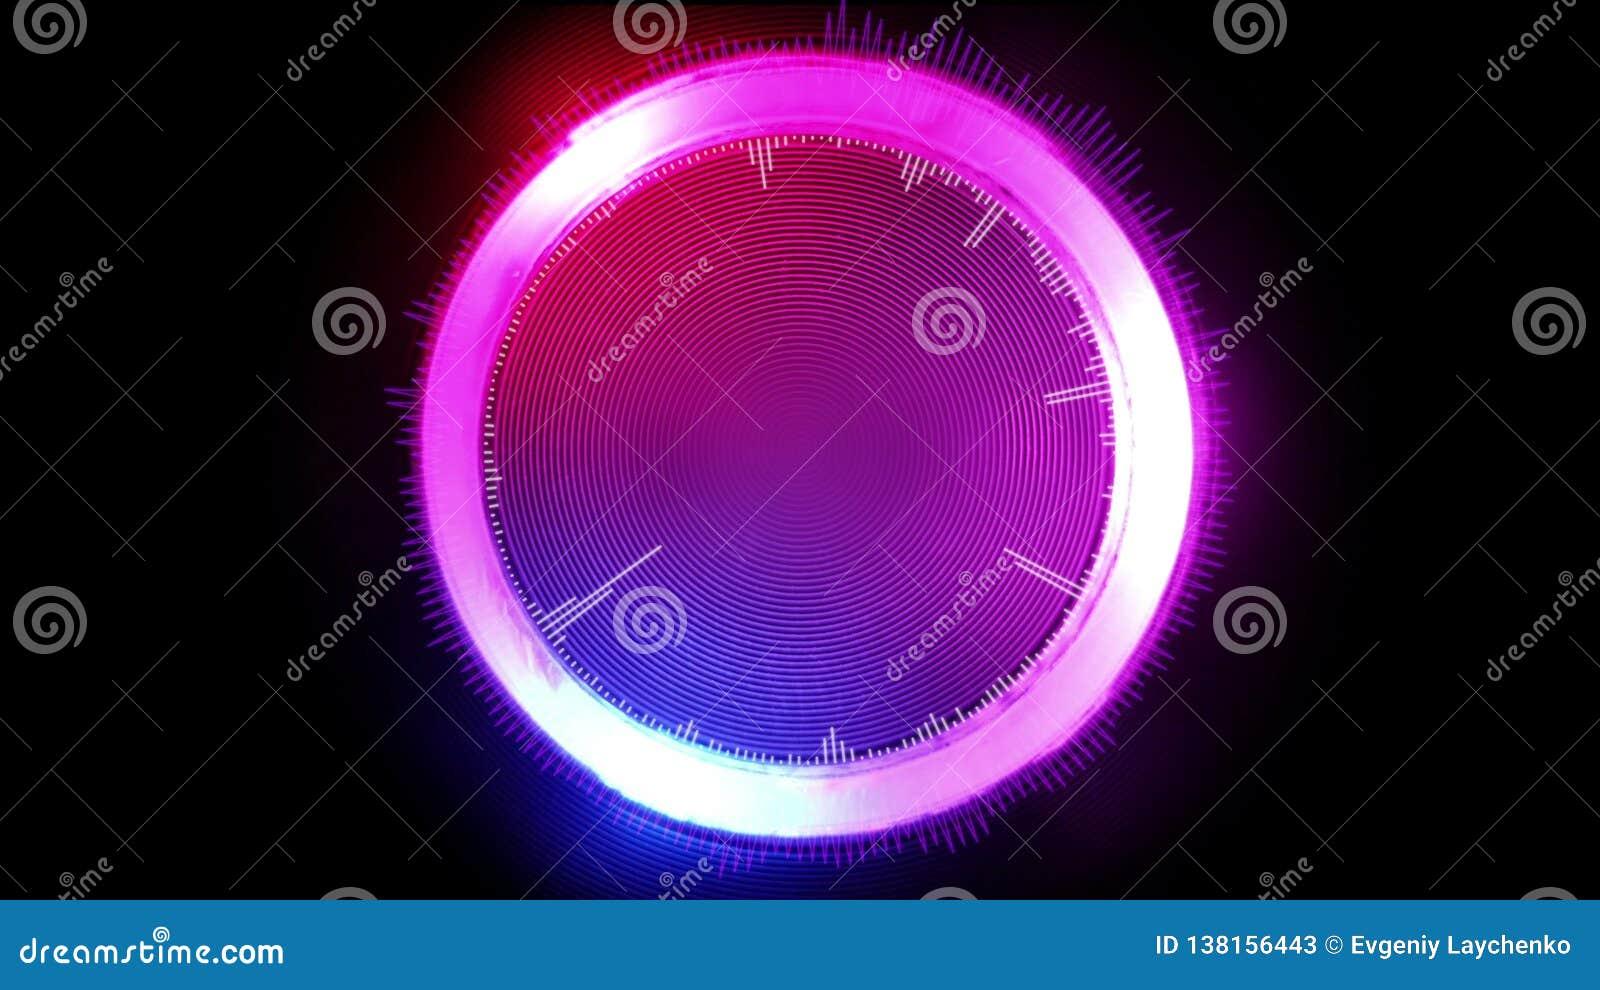 Abstracte futuristische grafische cirkel, die in verschillende kleuren, 3D illustratie gloeien